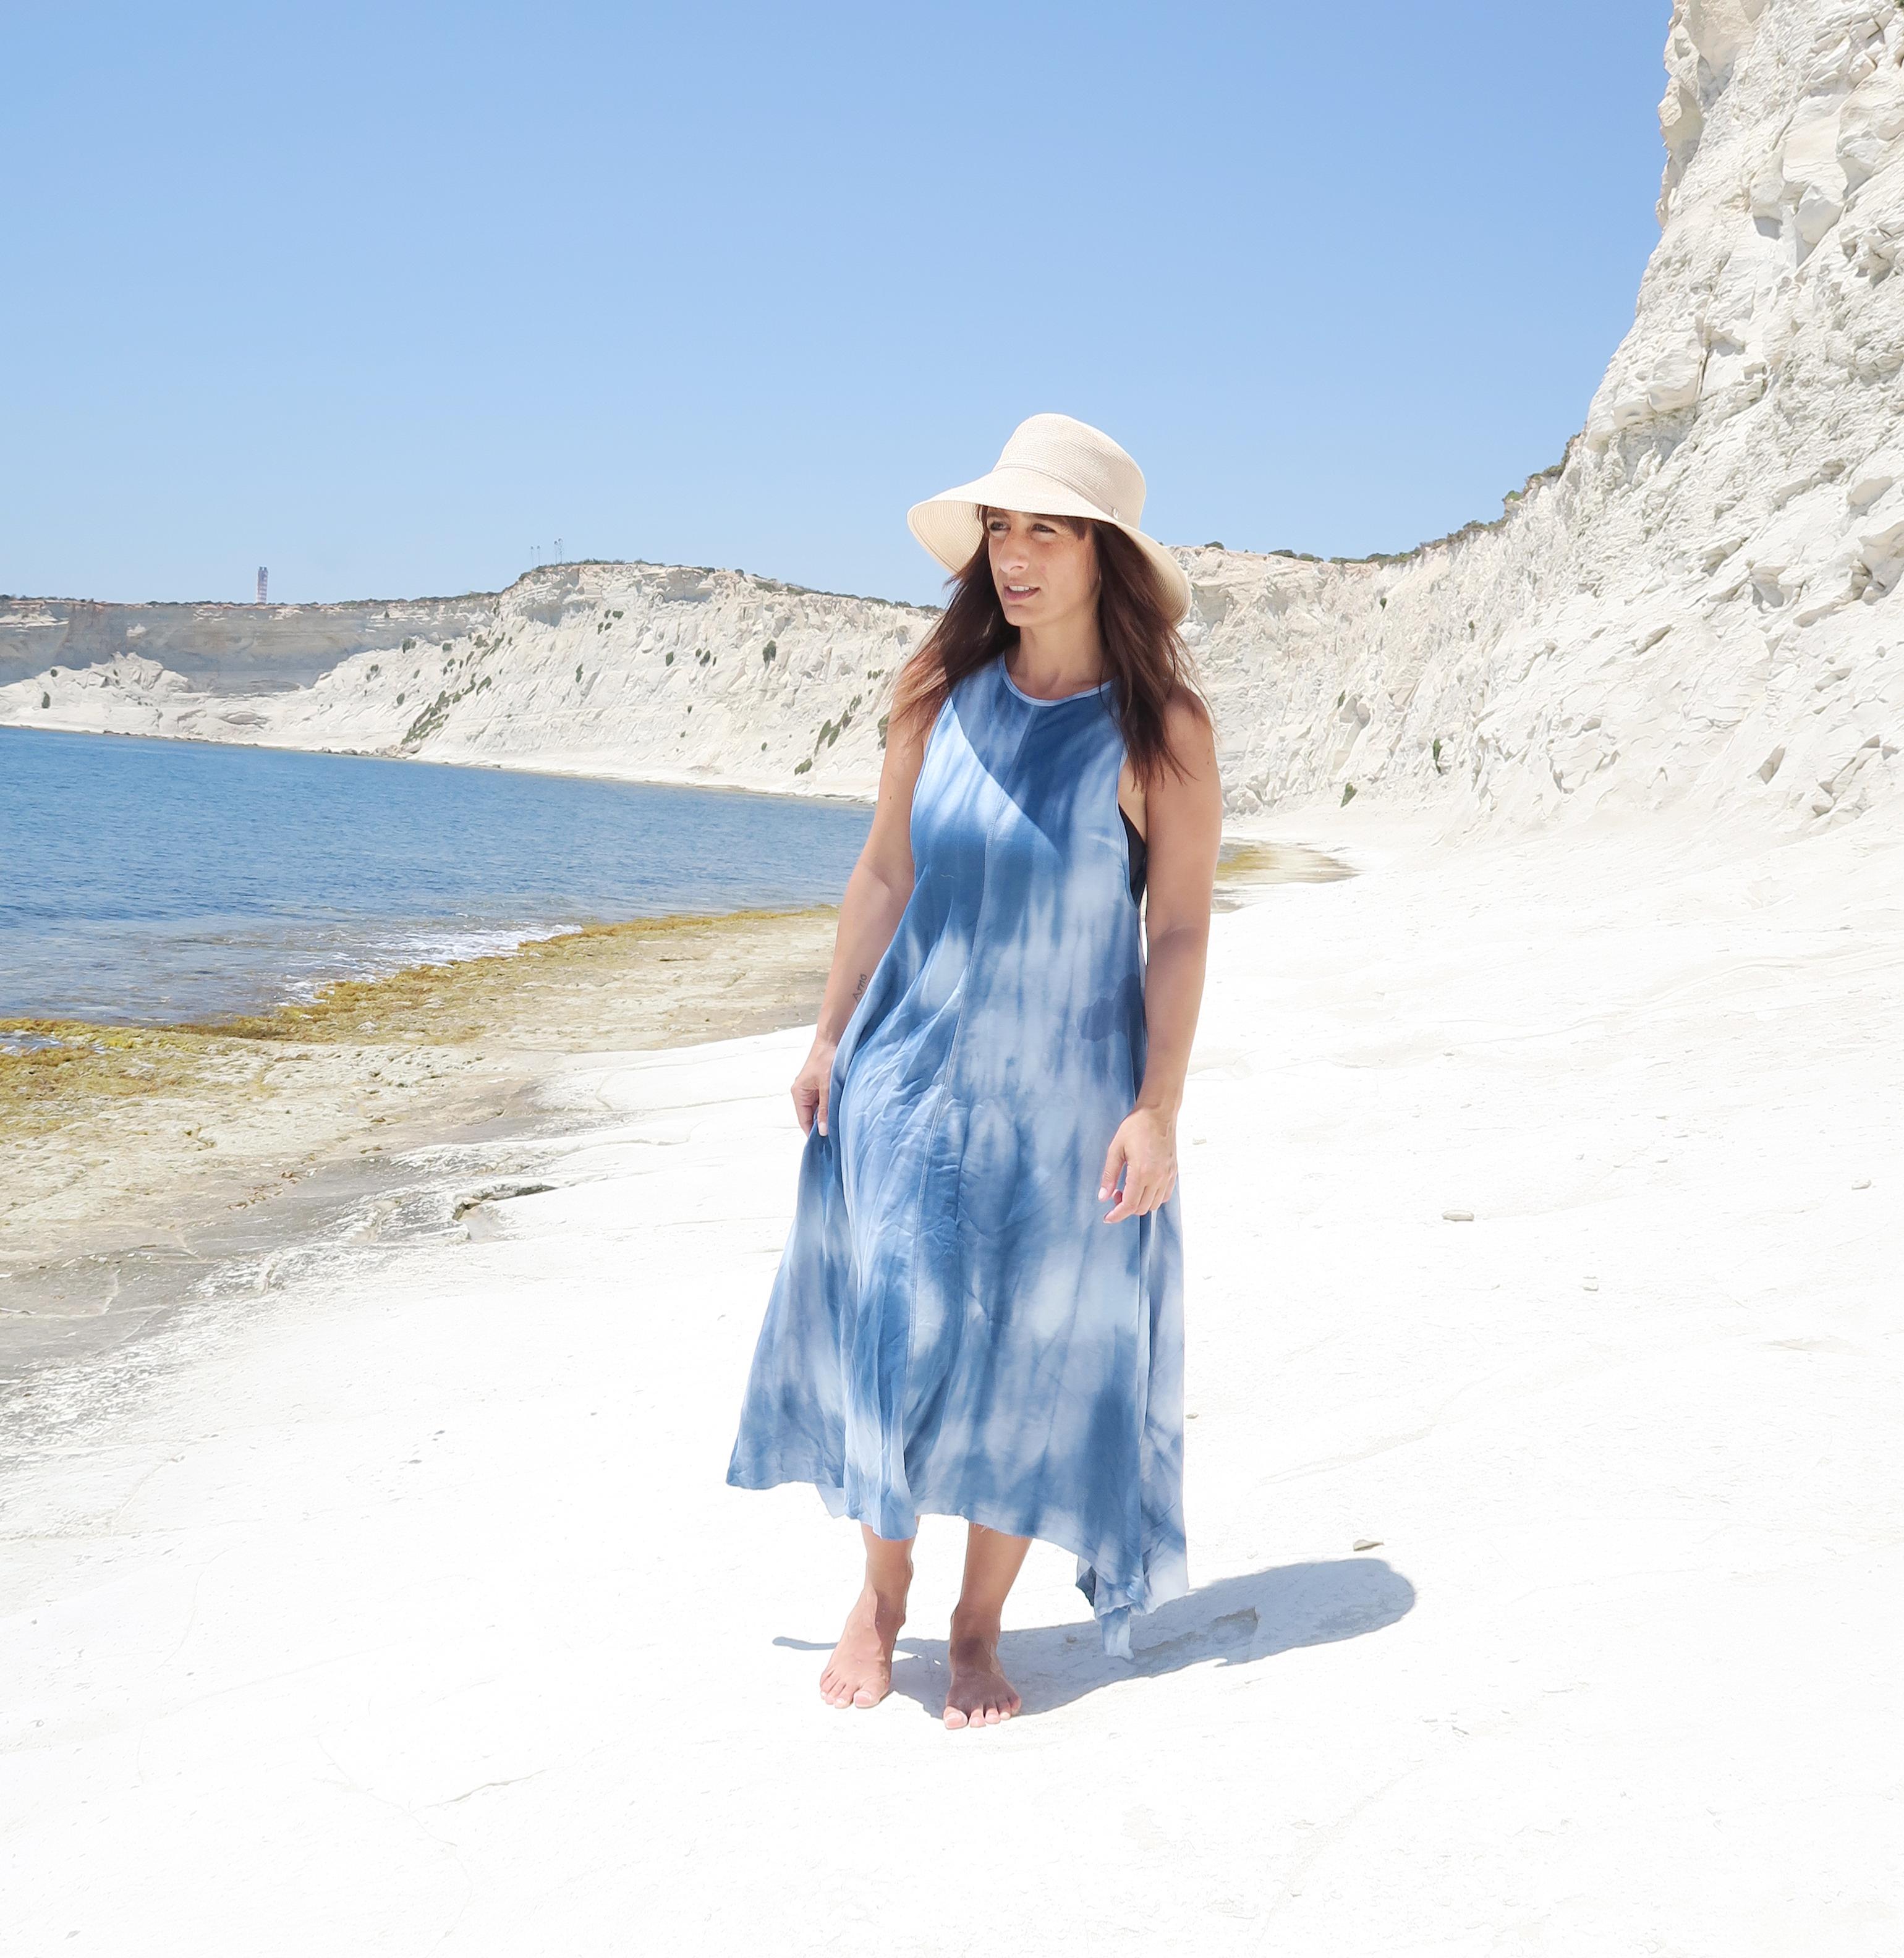 Malta-Blogger-Streetstyle-Fashion-Modeblogger-Fashionblogger-2